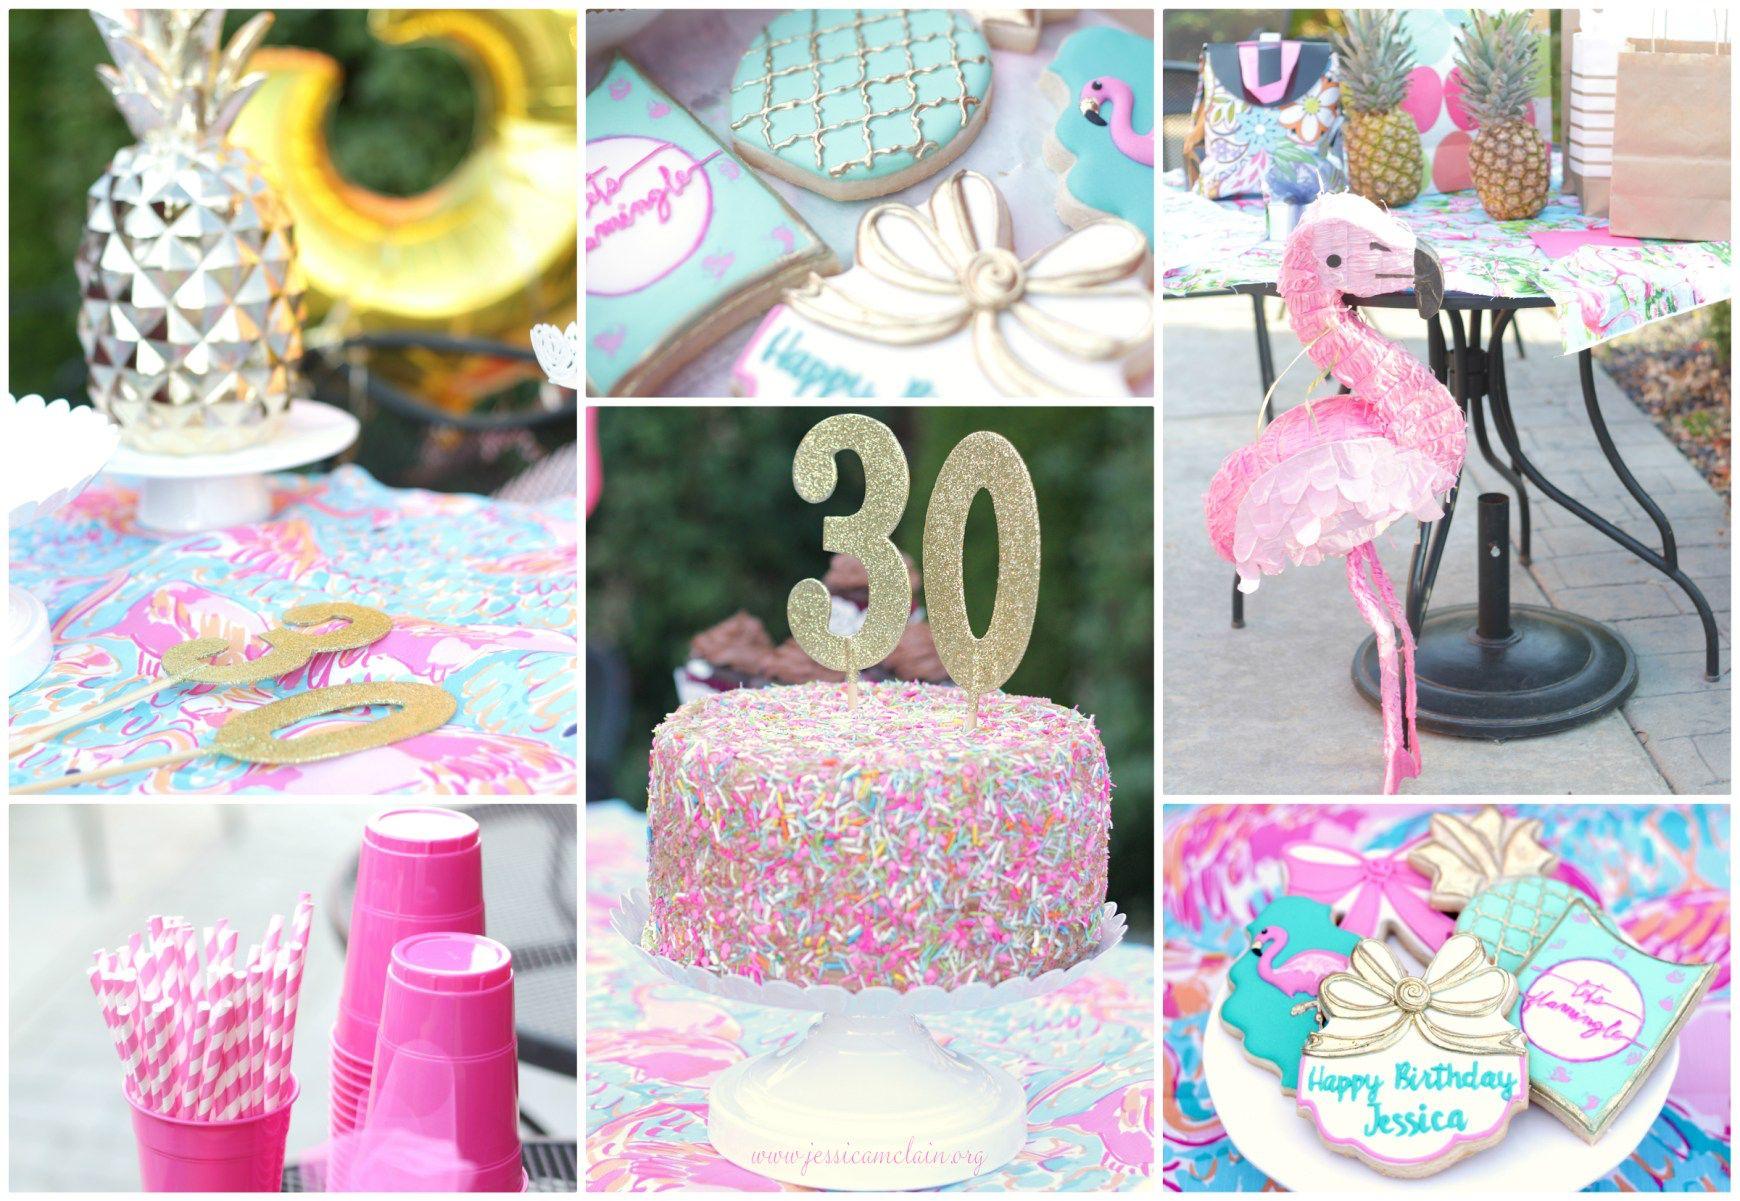 Jessica S 30 Let S Flamingle Flamingle Party Flamingo